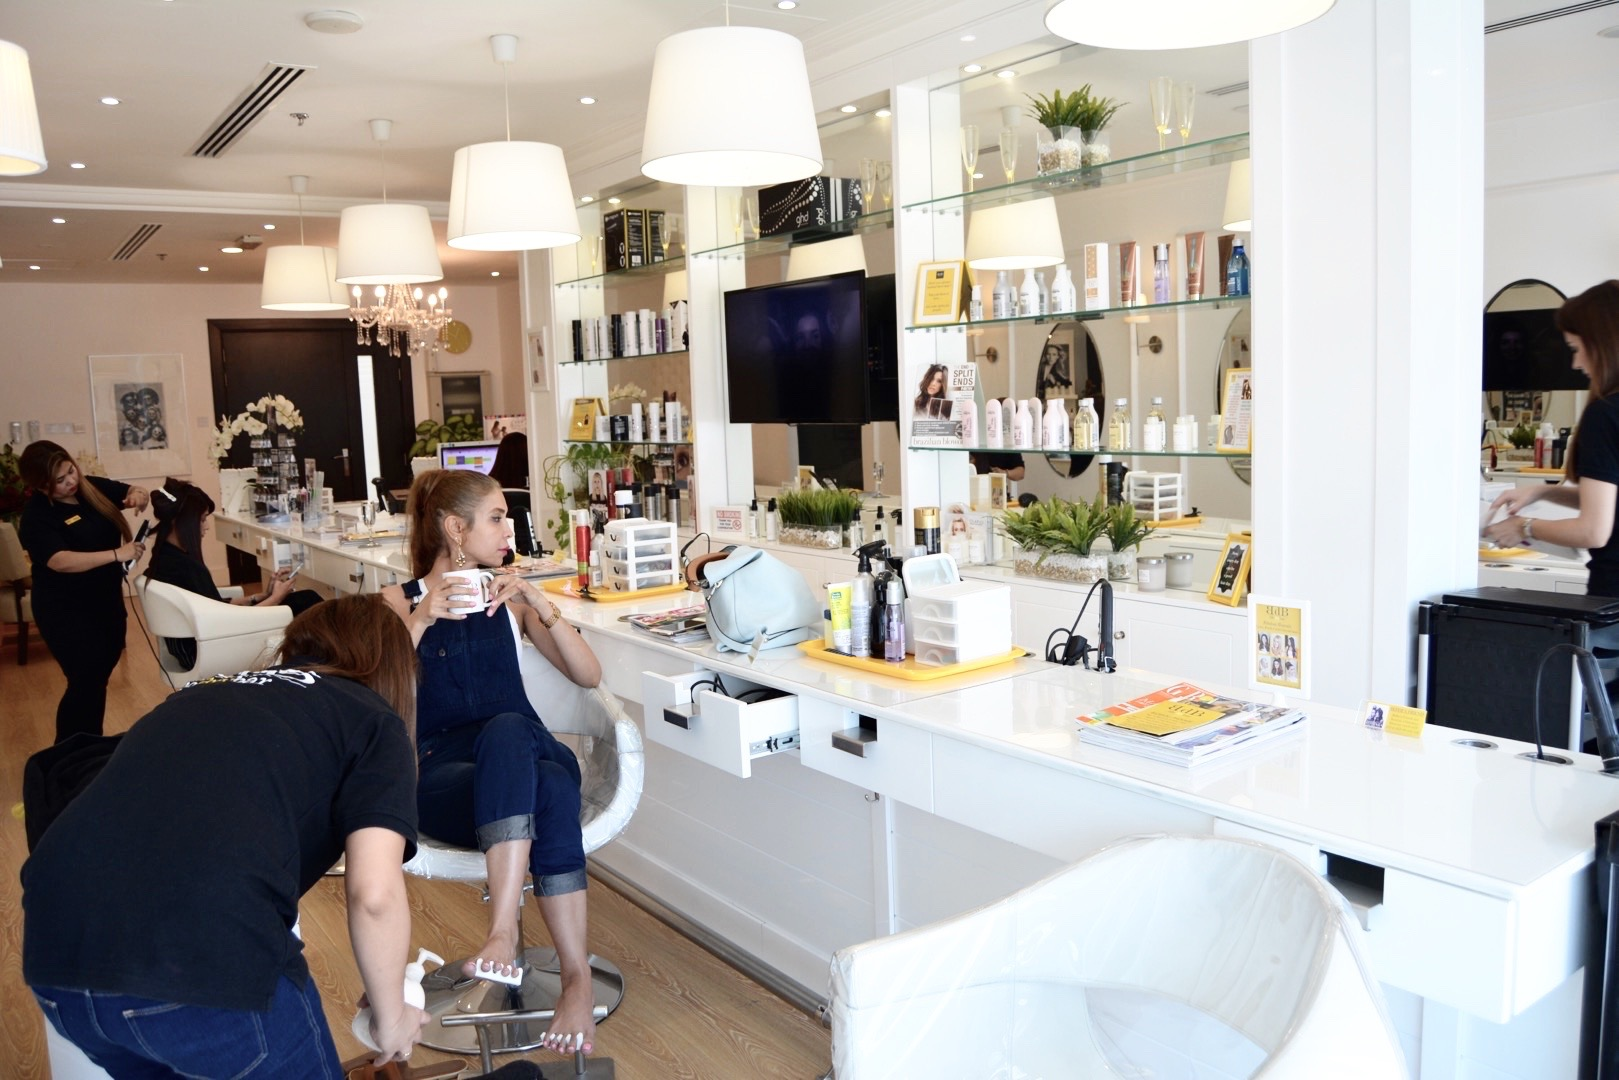 Blo dry bar bdb salon in dubai mrs jj loves hair for Blo hair salon